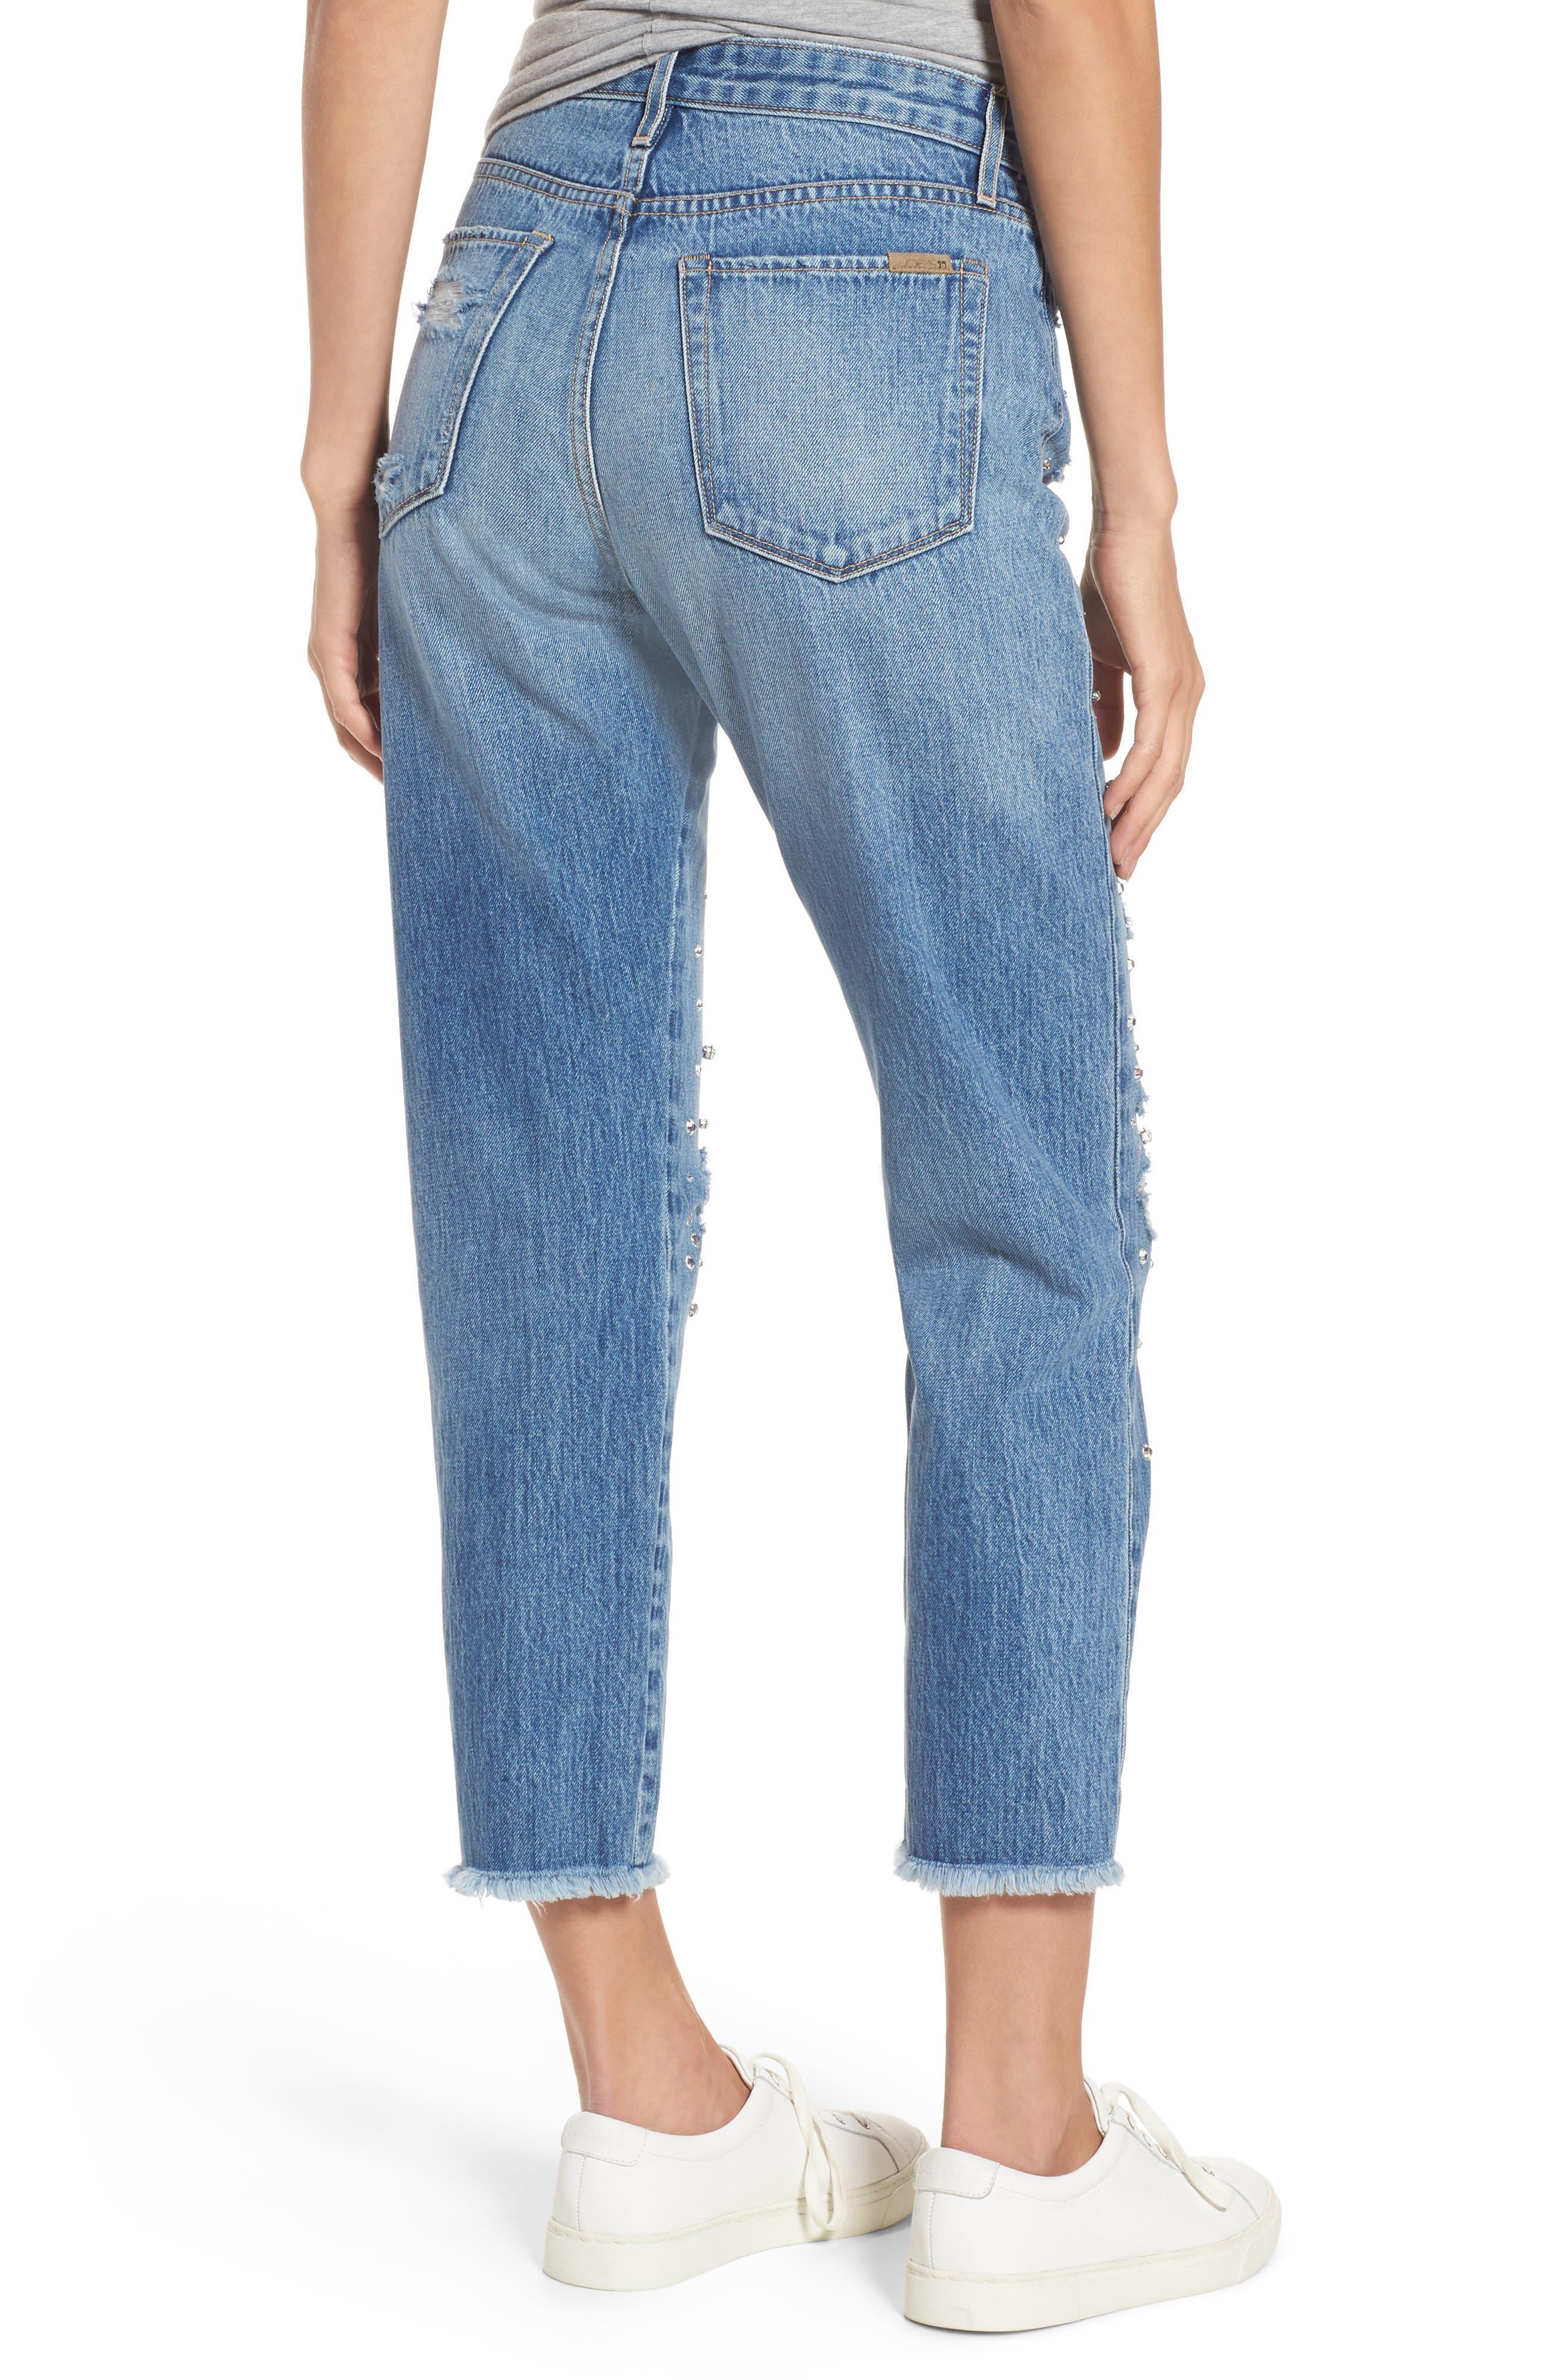 Jeans Smith Rhinestone Crop Boyfriend Jeans,                             Alternate thumbnail 2, color,                             450